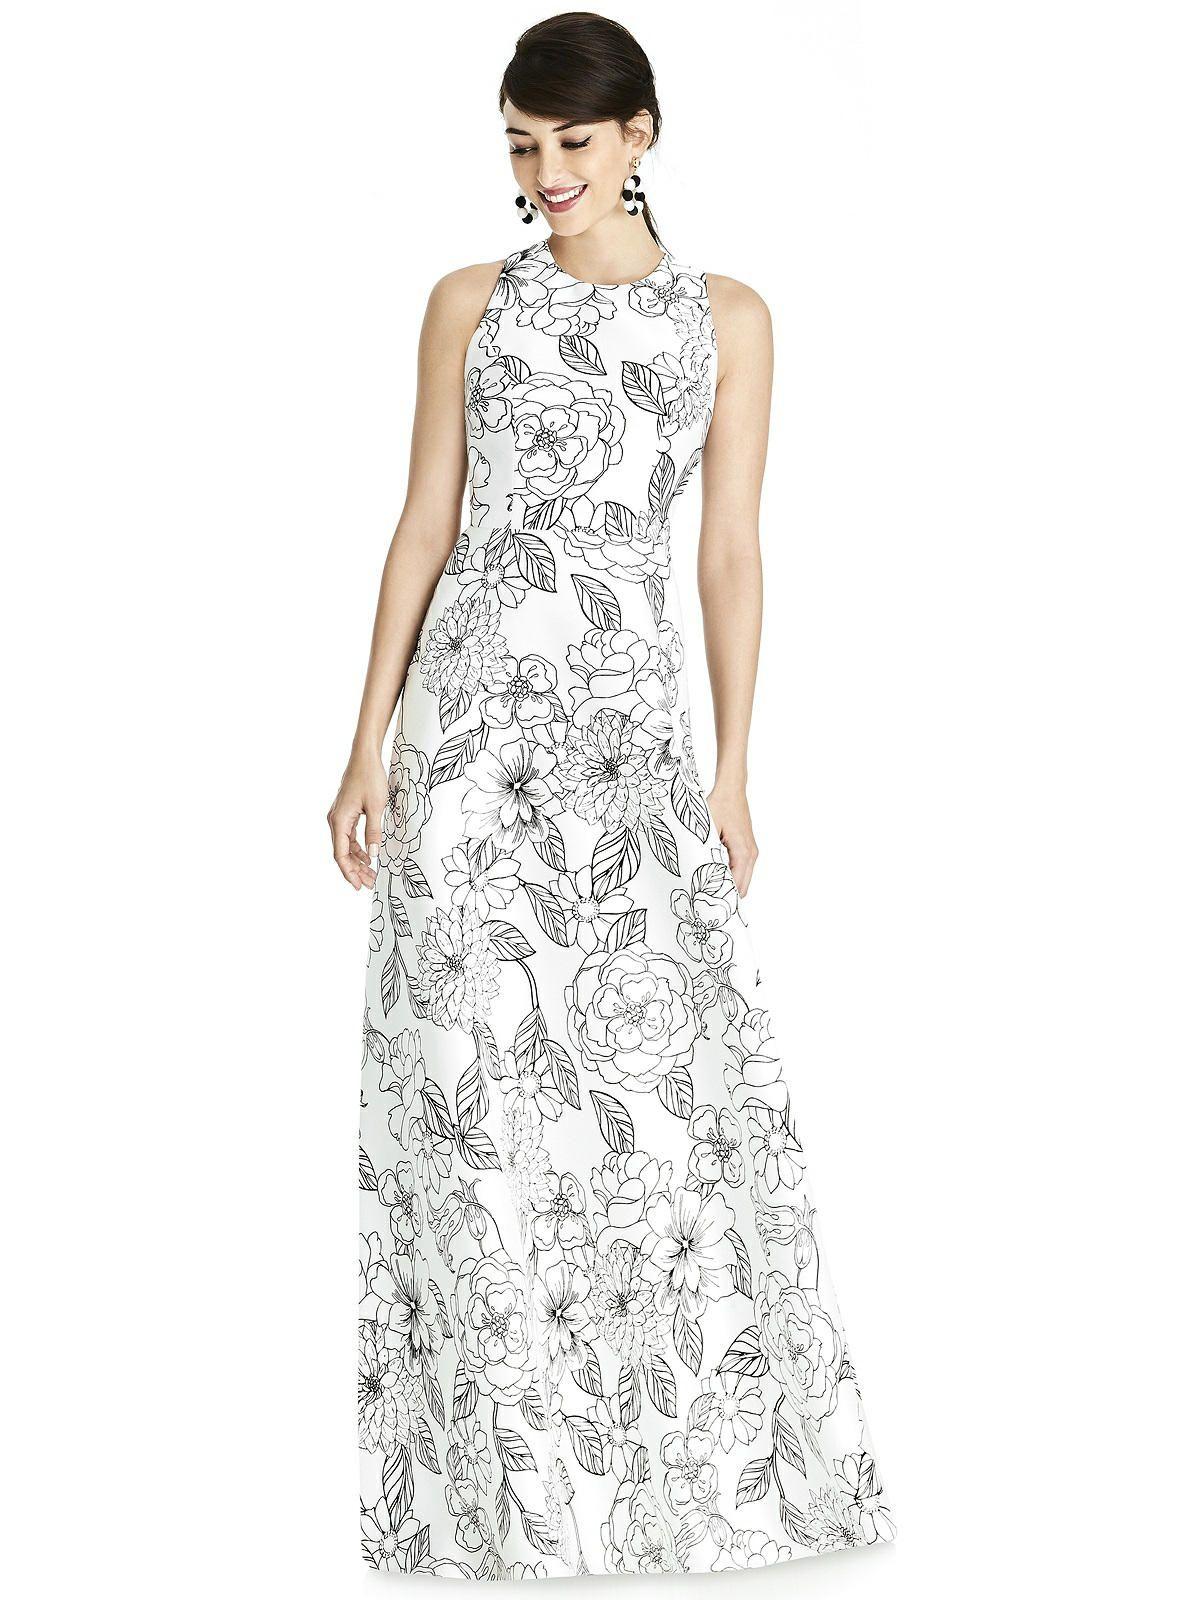 5de7f68f3 Alfred Sung D746fp - Sateen Twill Bridesmaid Dress In Botanica in ...